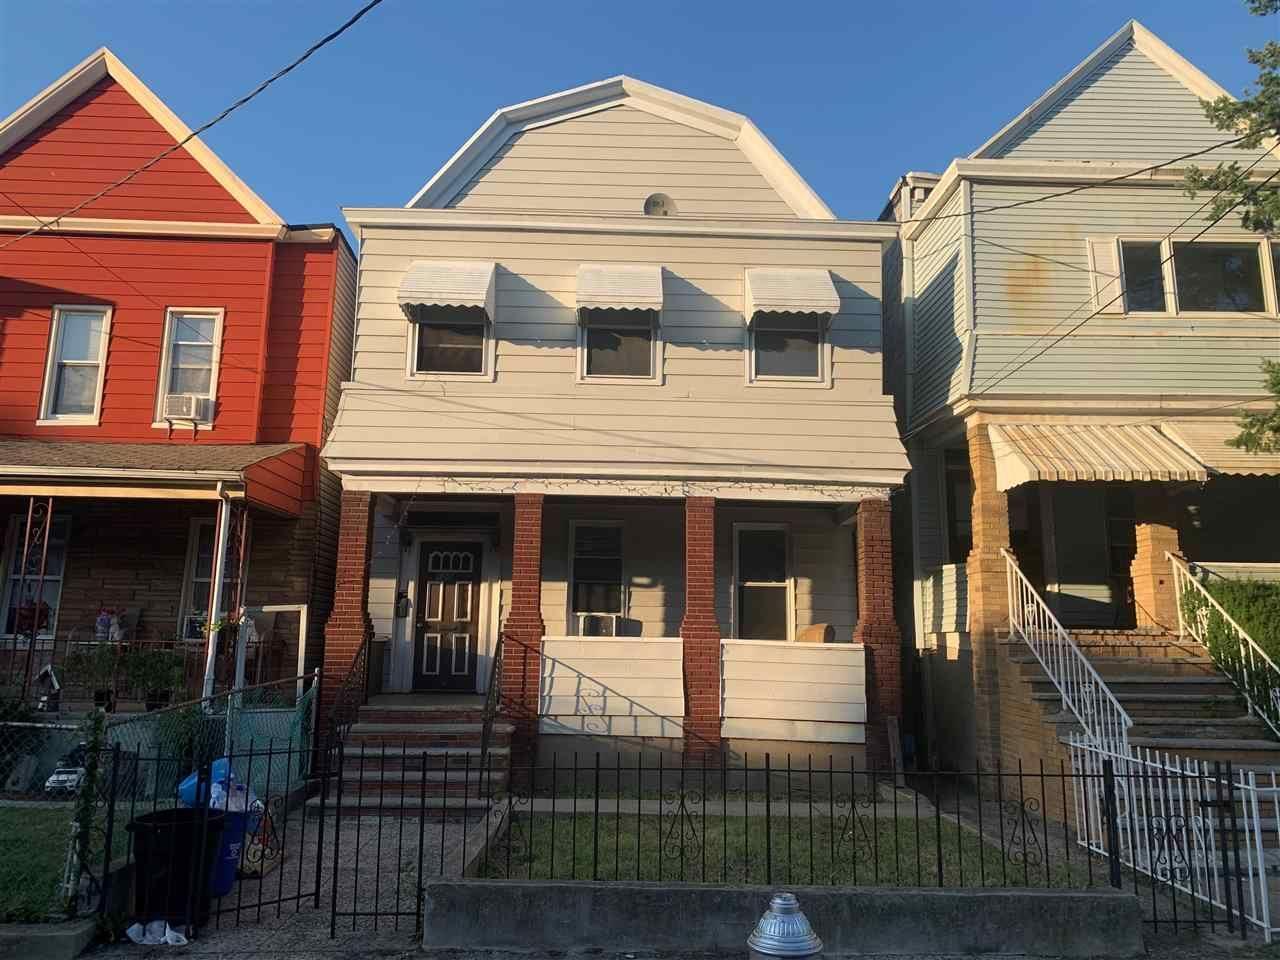 100 CLAREMONT AVE, Jersey City, NJ 07305-3604 - MLS#: 210002938